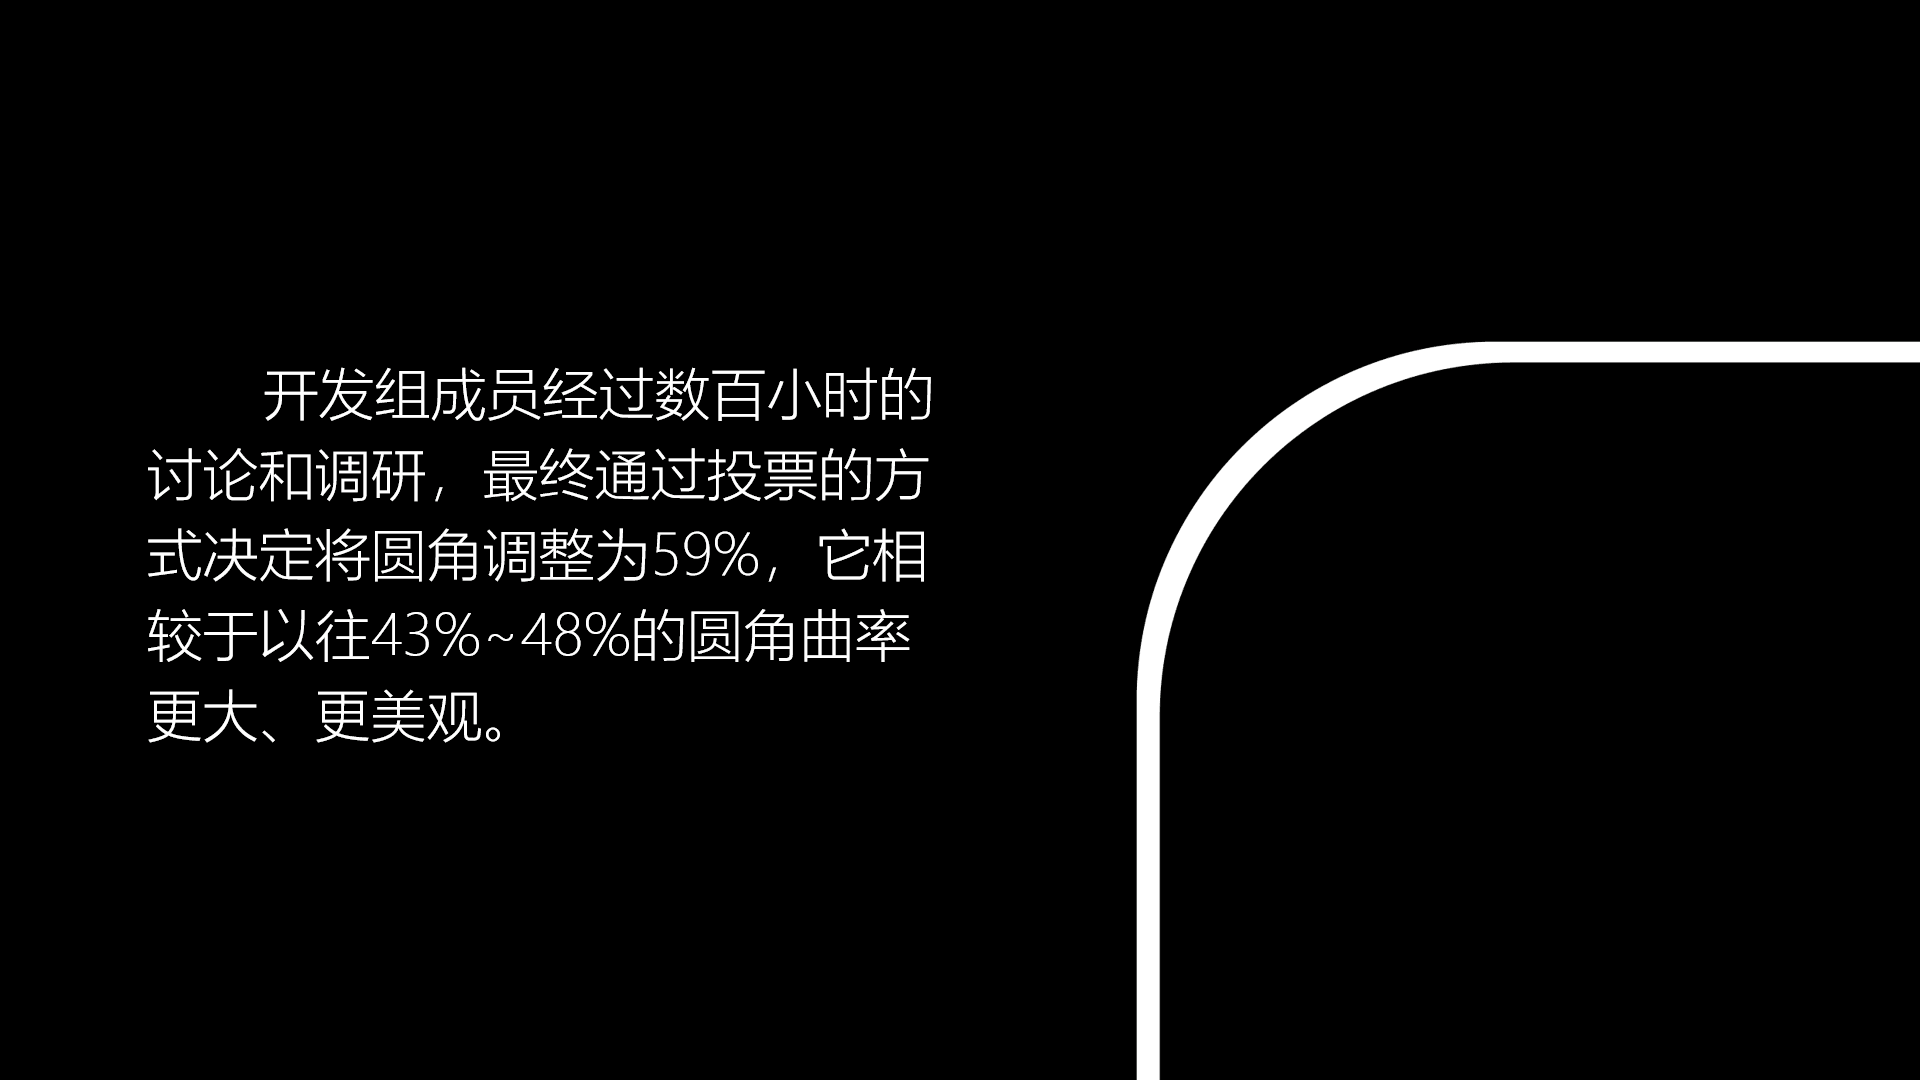 ]LVY5{39)2N]O]UGFNB%F4P.png